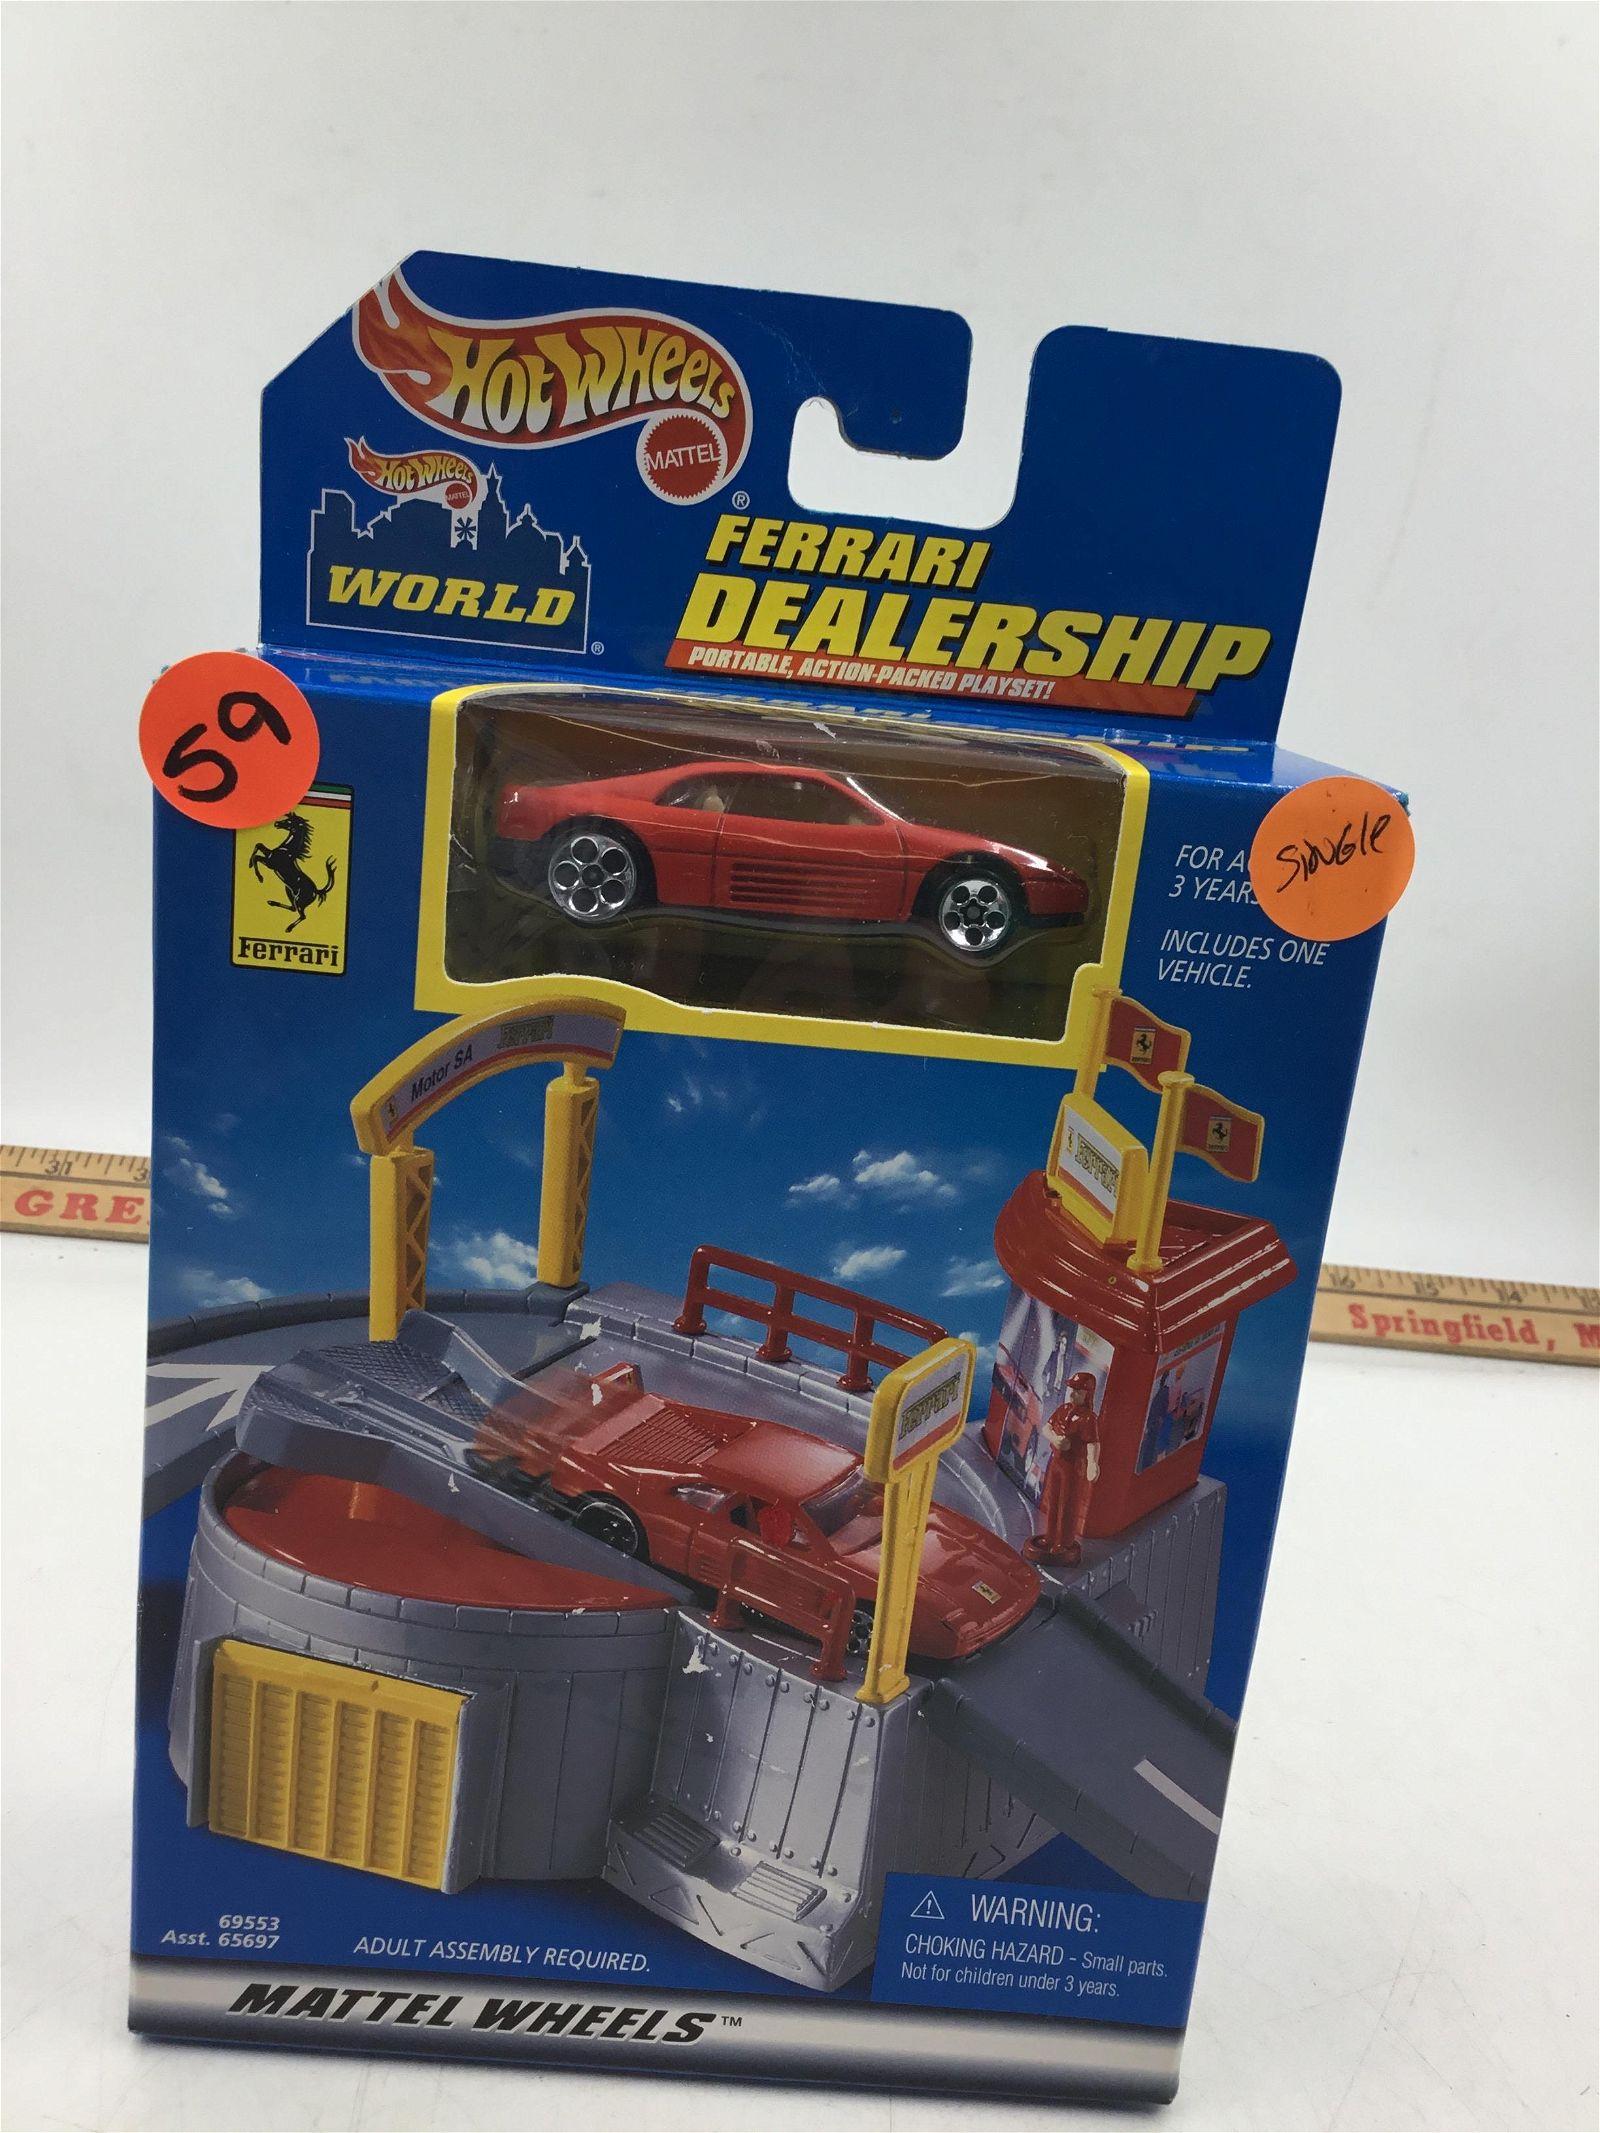 2000 Hot Wheels Ferrari dealership play set